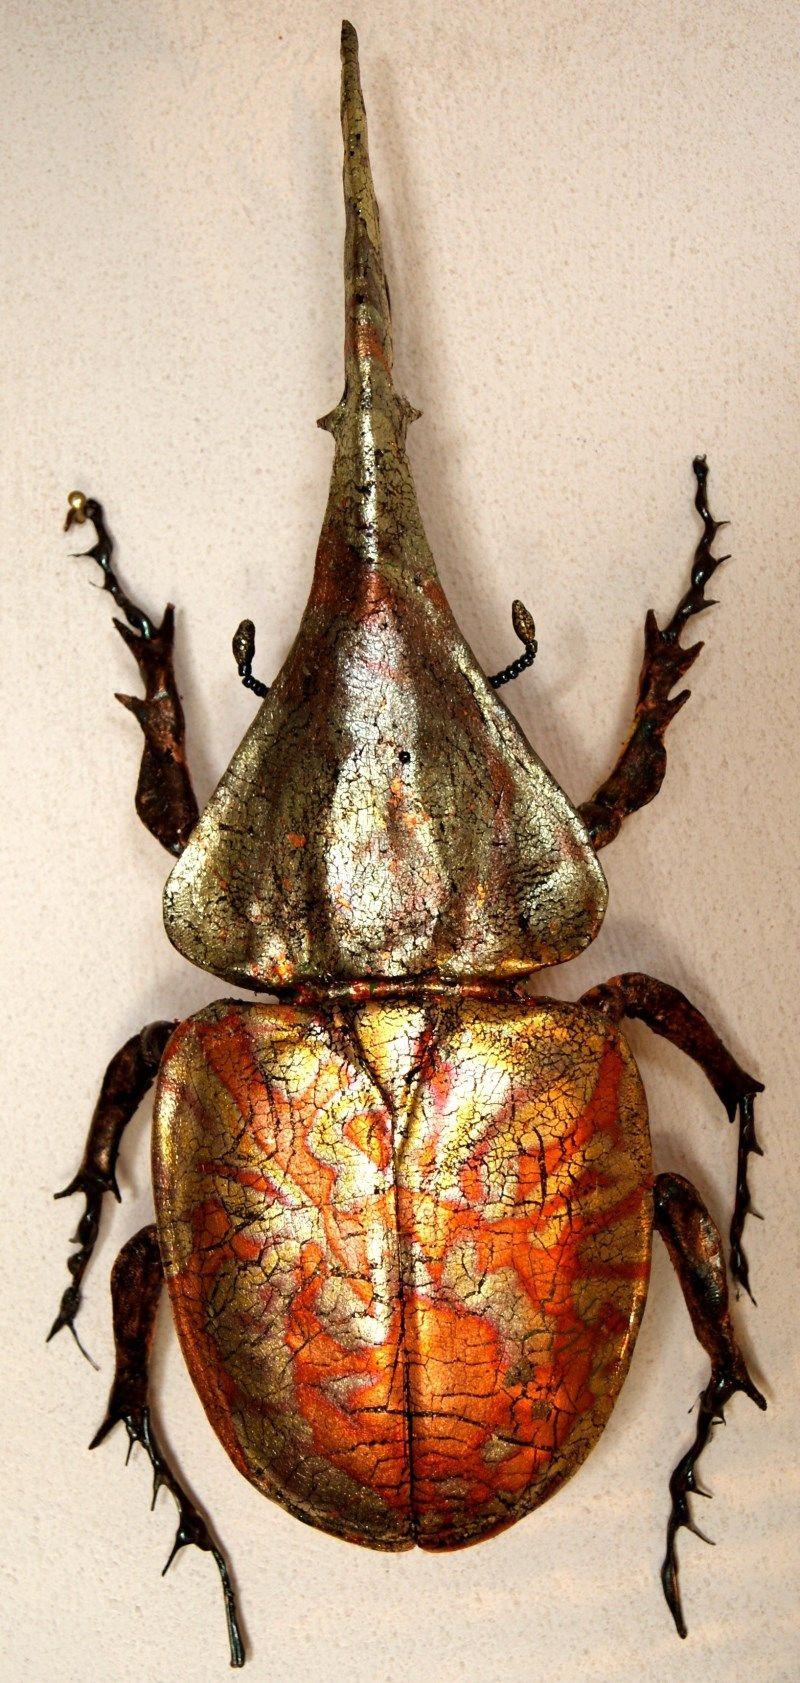 MATANA Dynastes hercules - Fimo und Schlagmetall | #BugZ | Pinterest ...